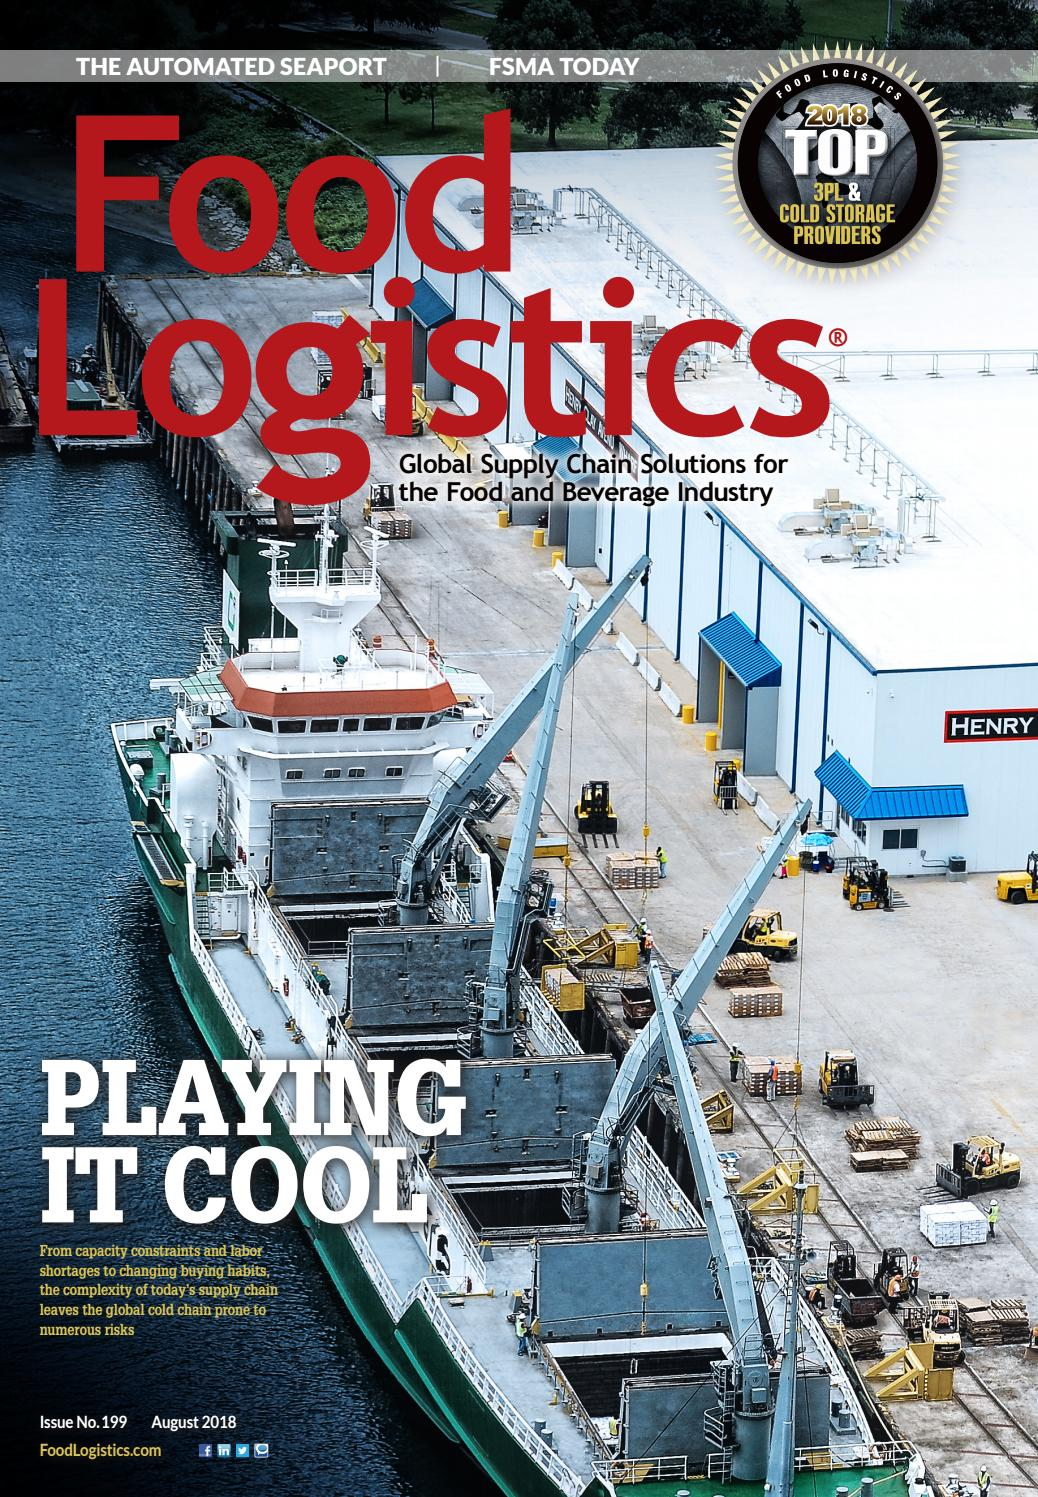 Food Logistics August 2018 by Supply+Demand Chain/Food Logistics - issuu